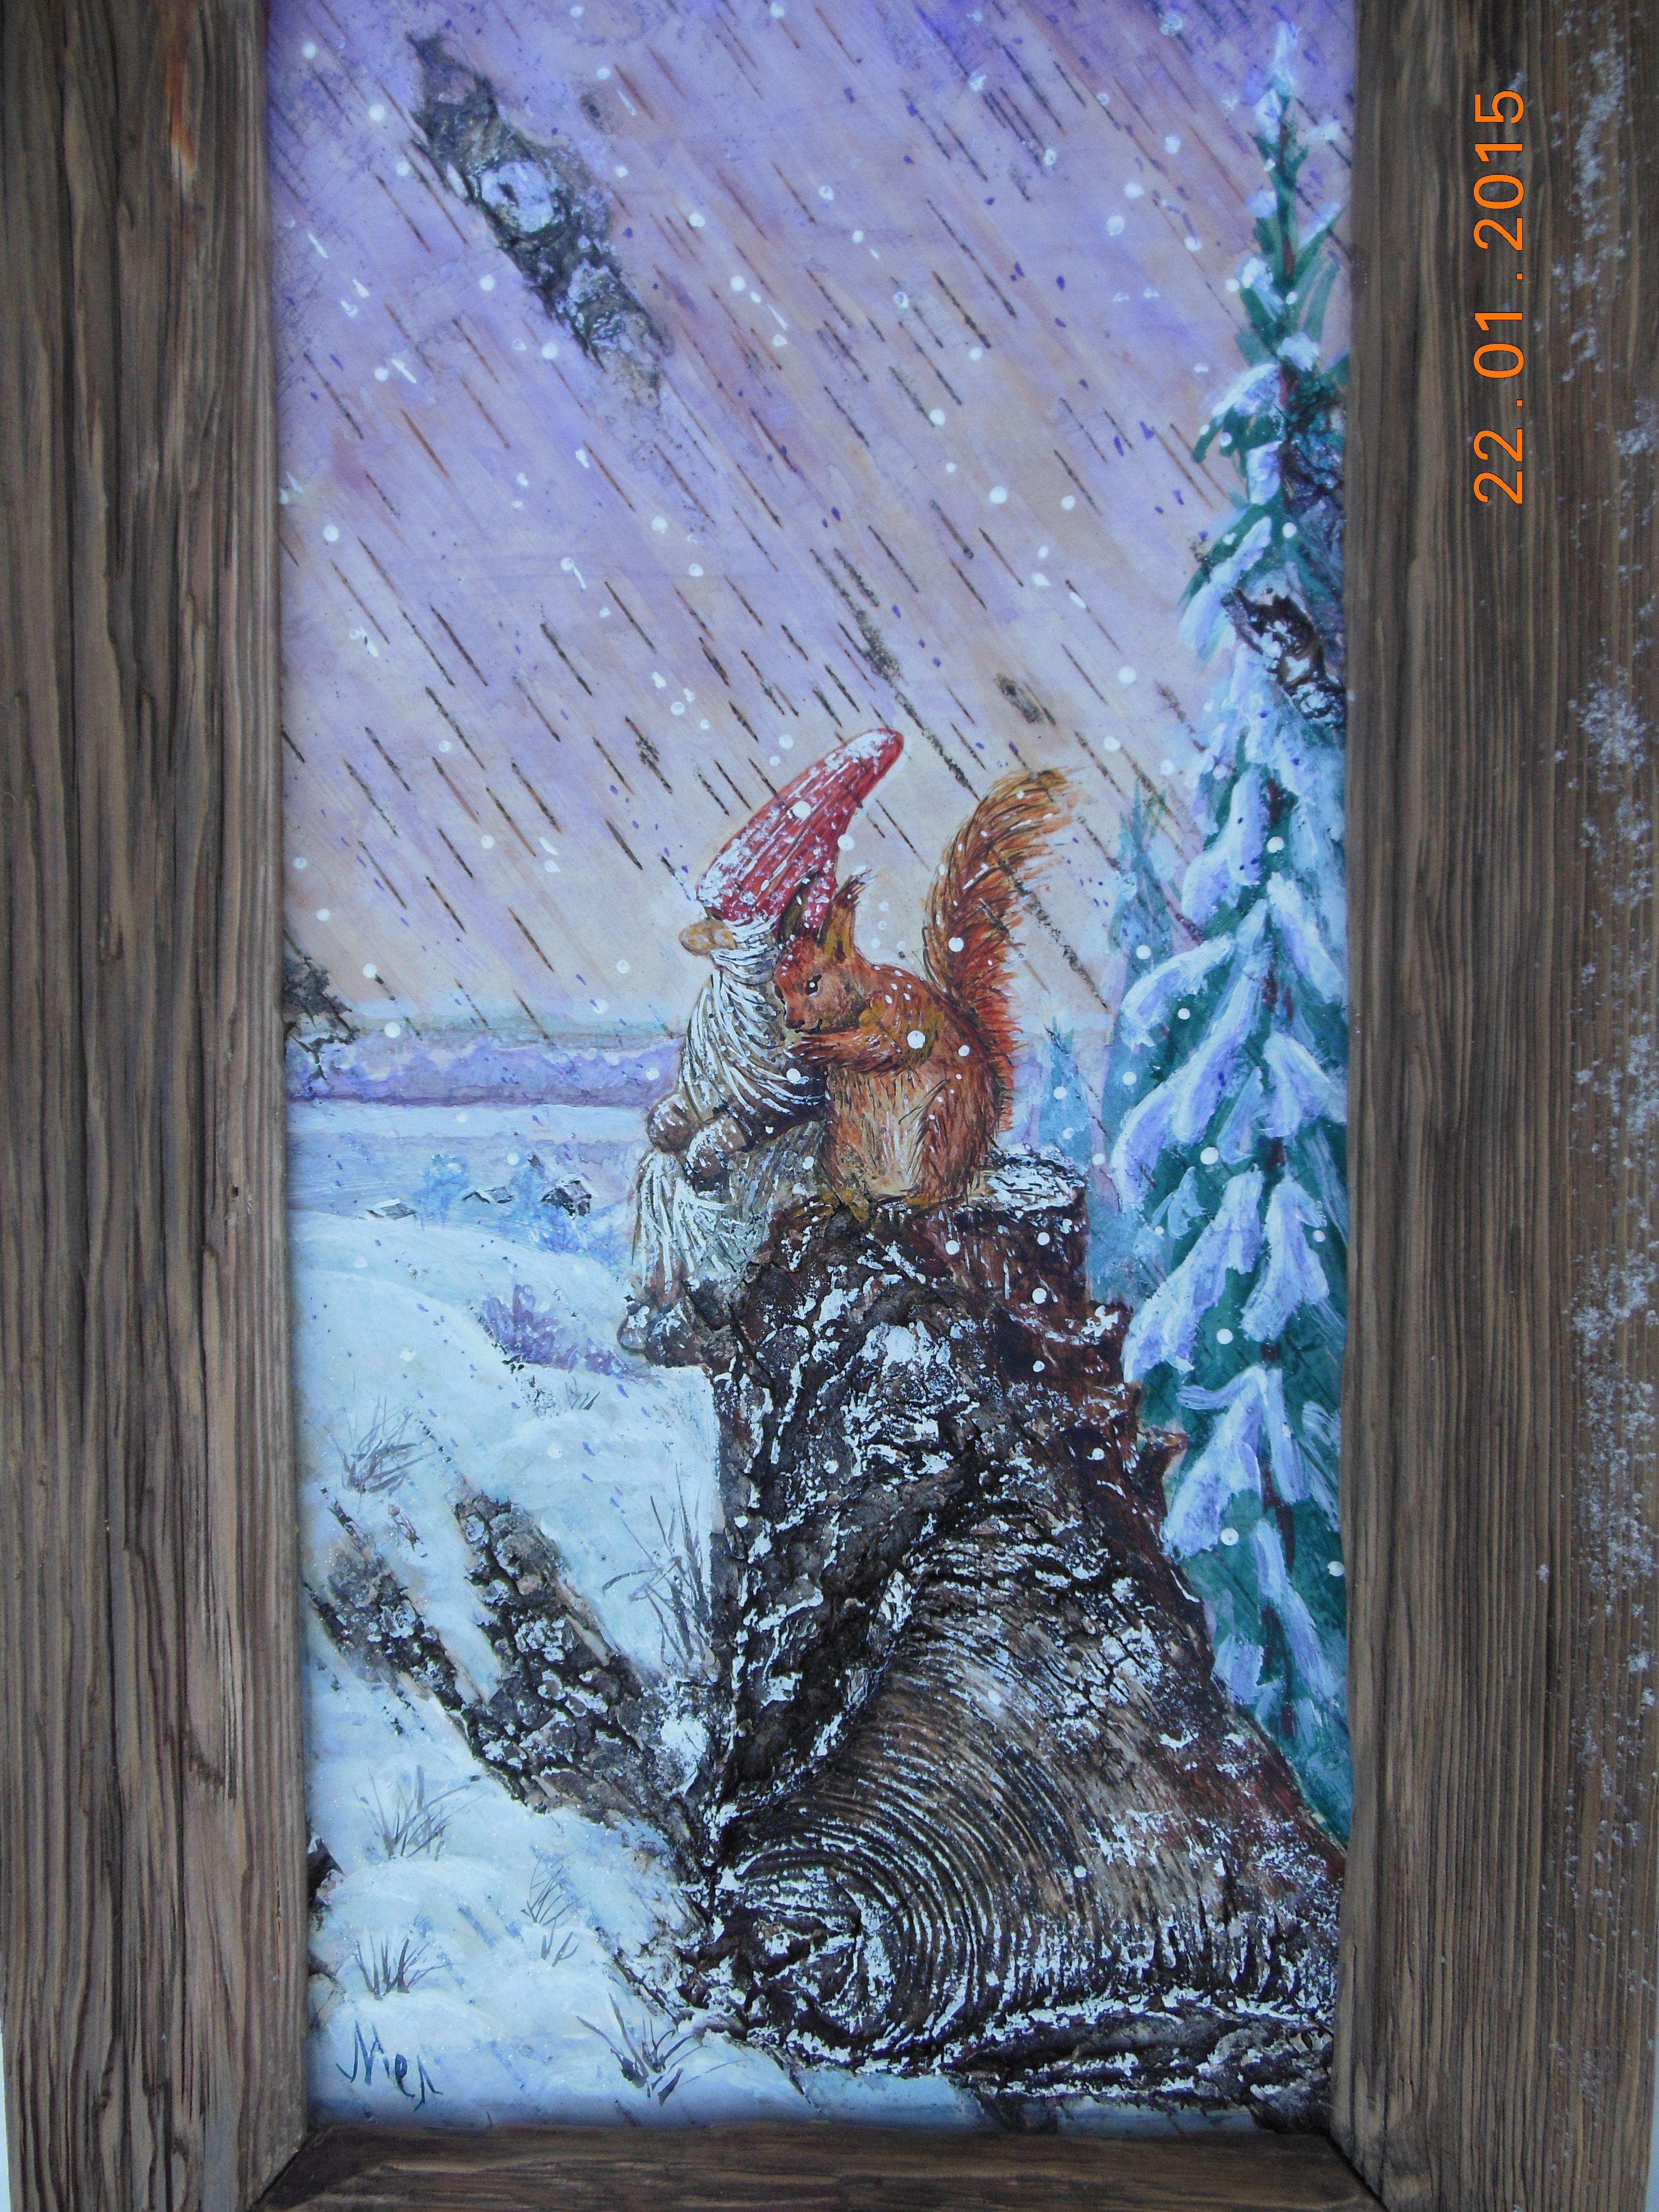 картина на бересте, Гном и белка, зимний ветер, пень